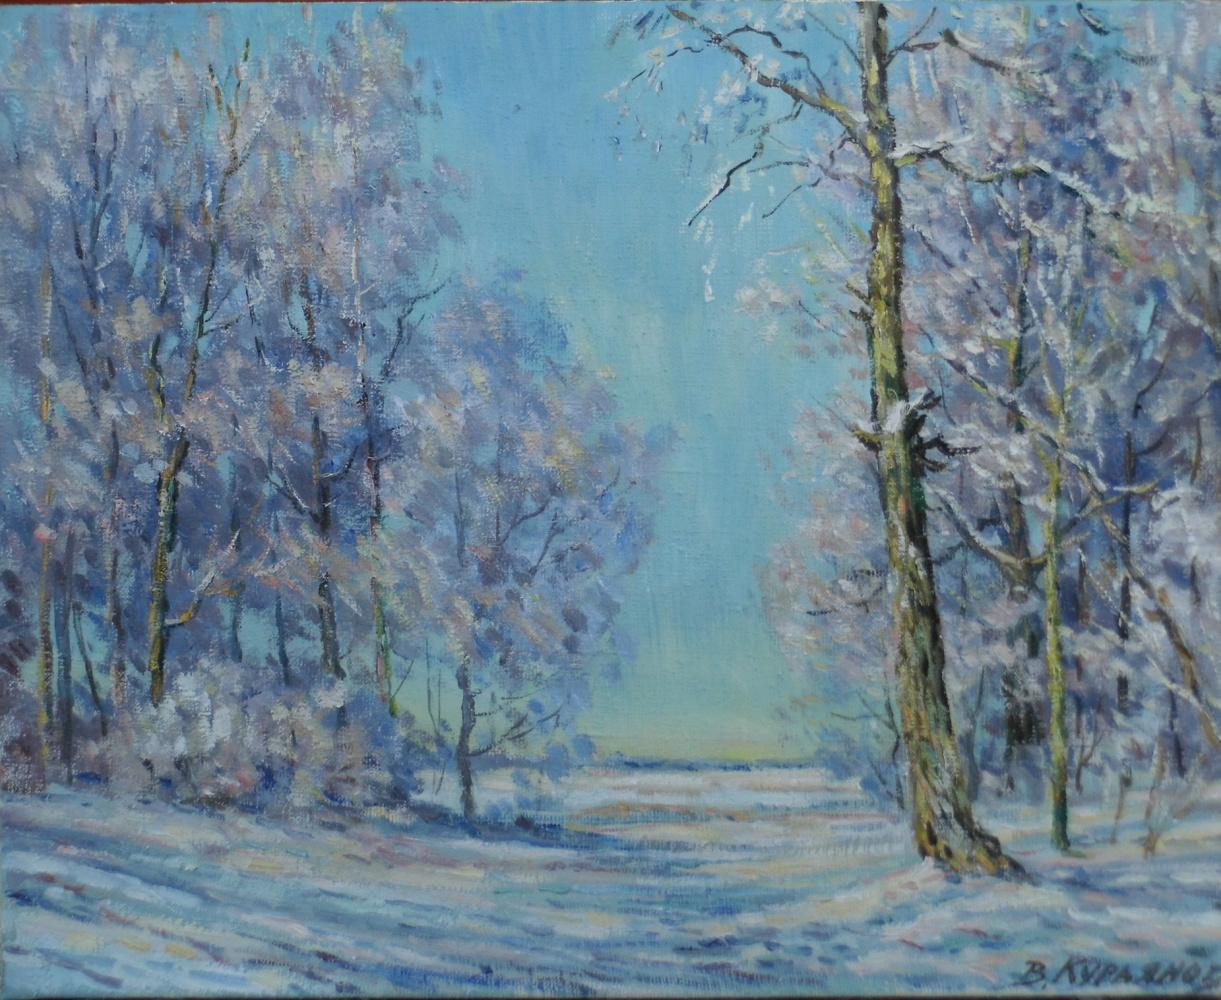 Victor Vladimirovich Kuryanov. The cold sun of winter